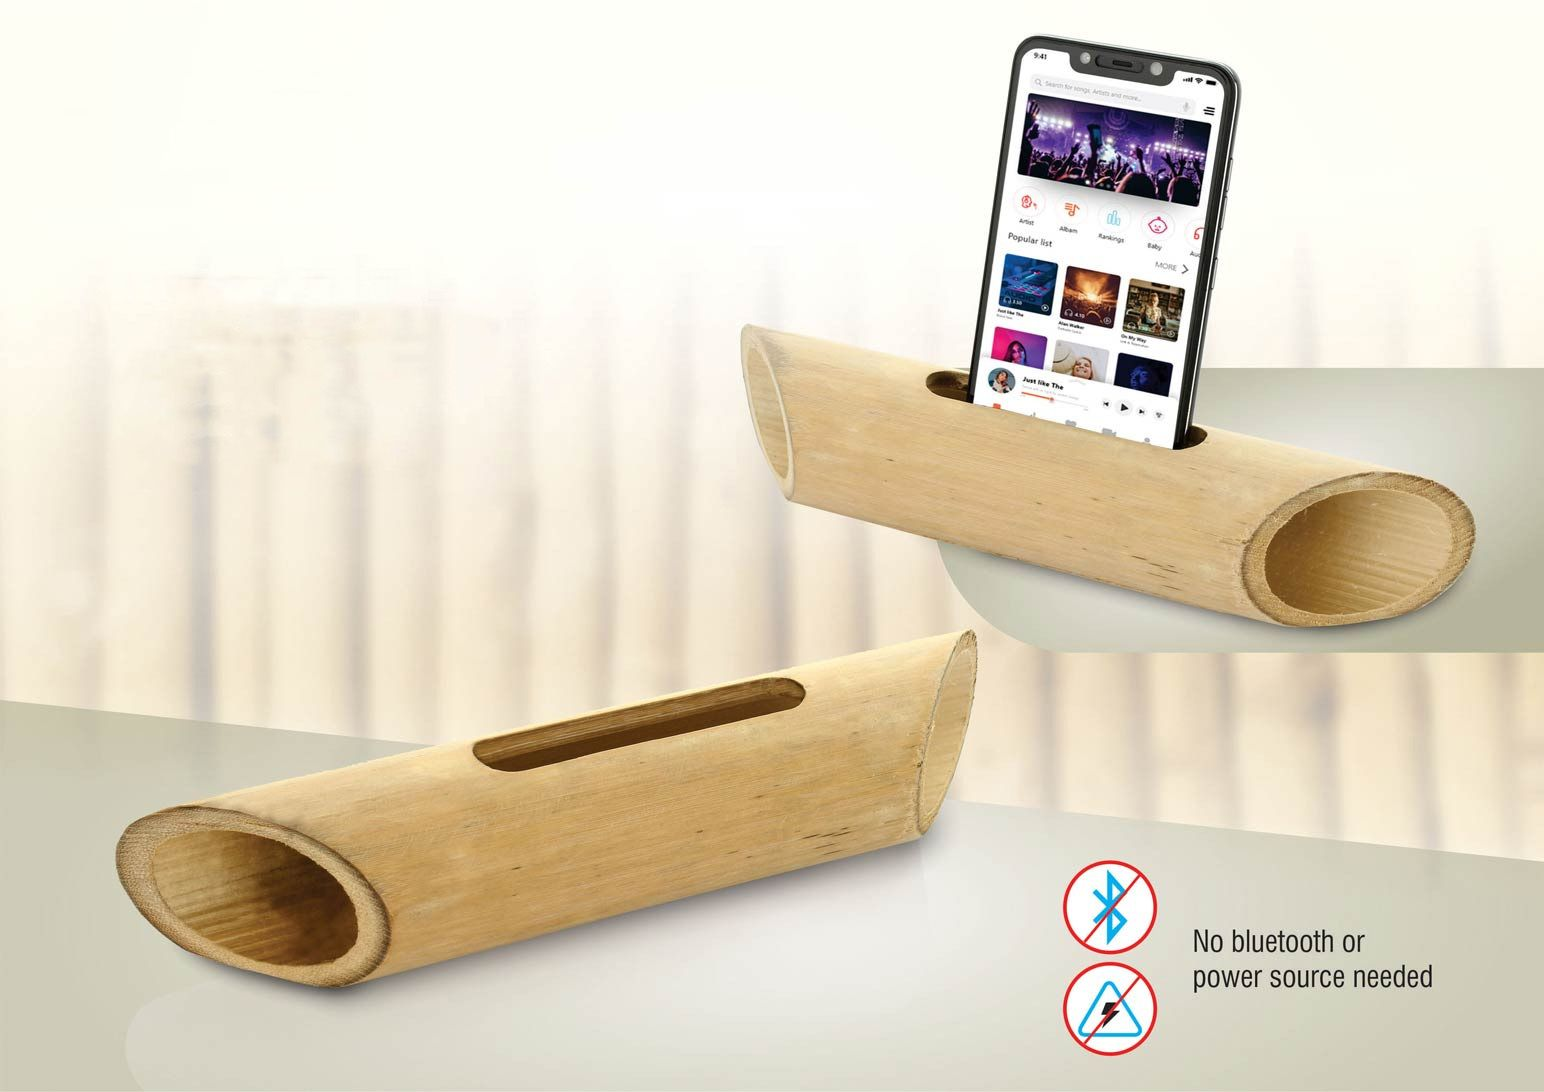 Power Plus Bamboo Music Amplifier For Smartphones   Universal Design E245 Wooden